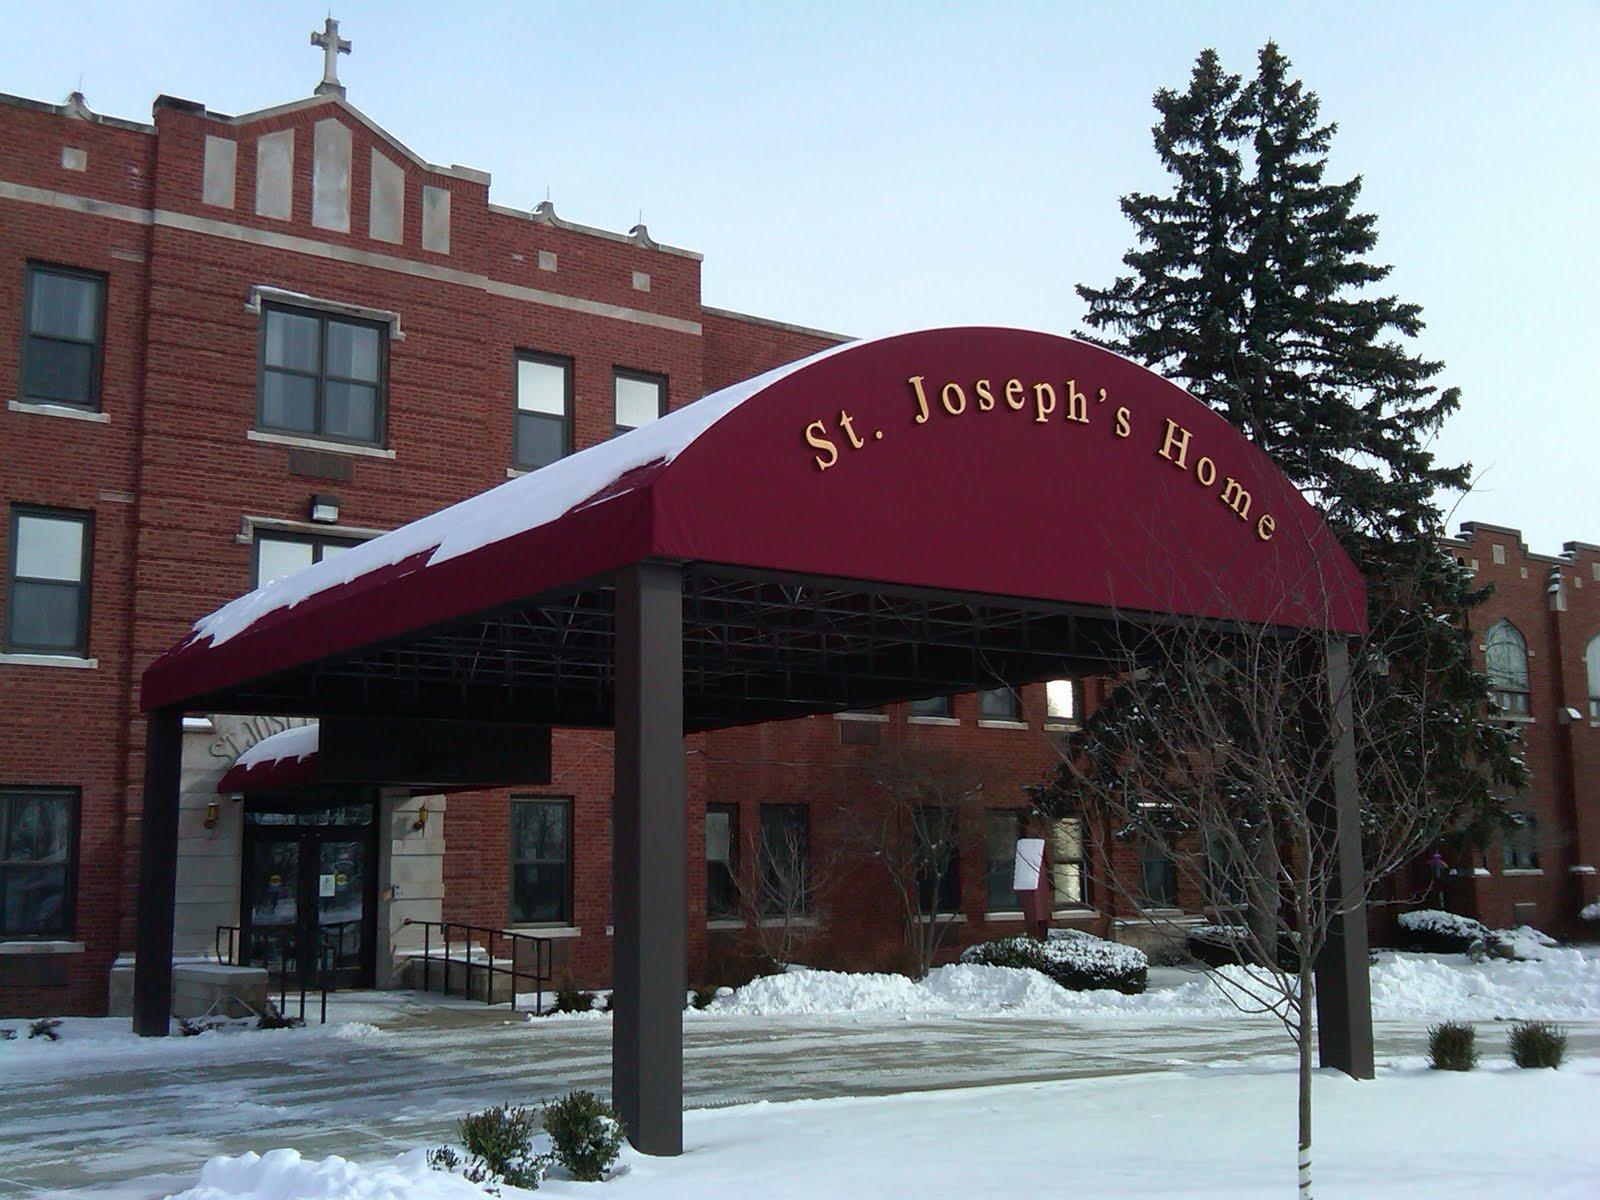 St. Joseph's House